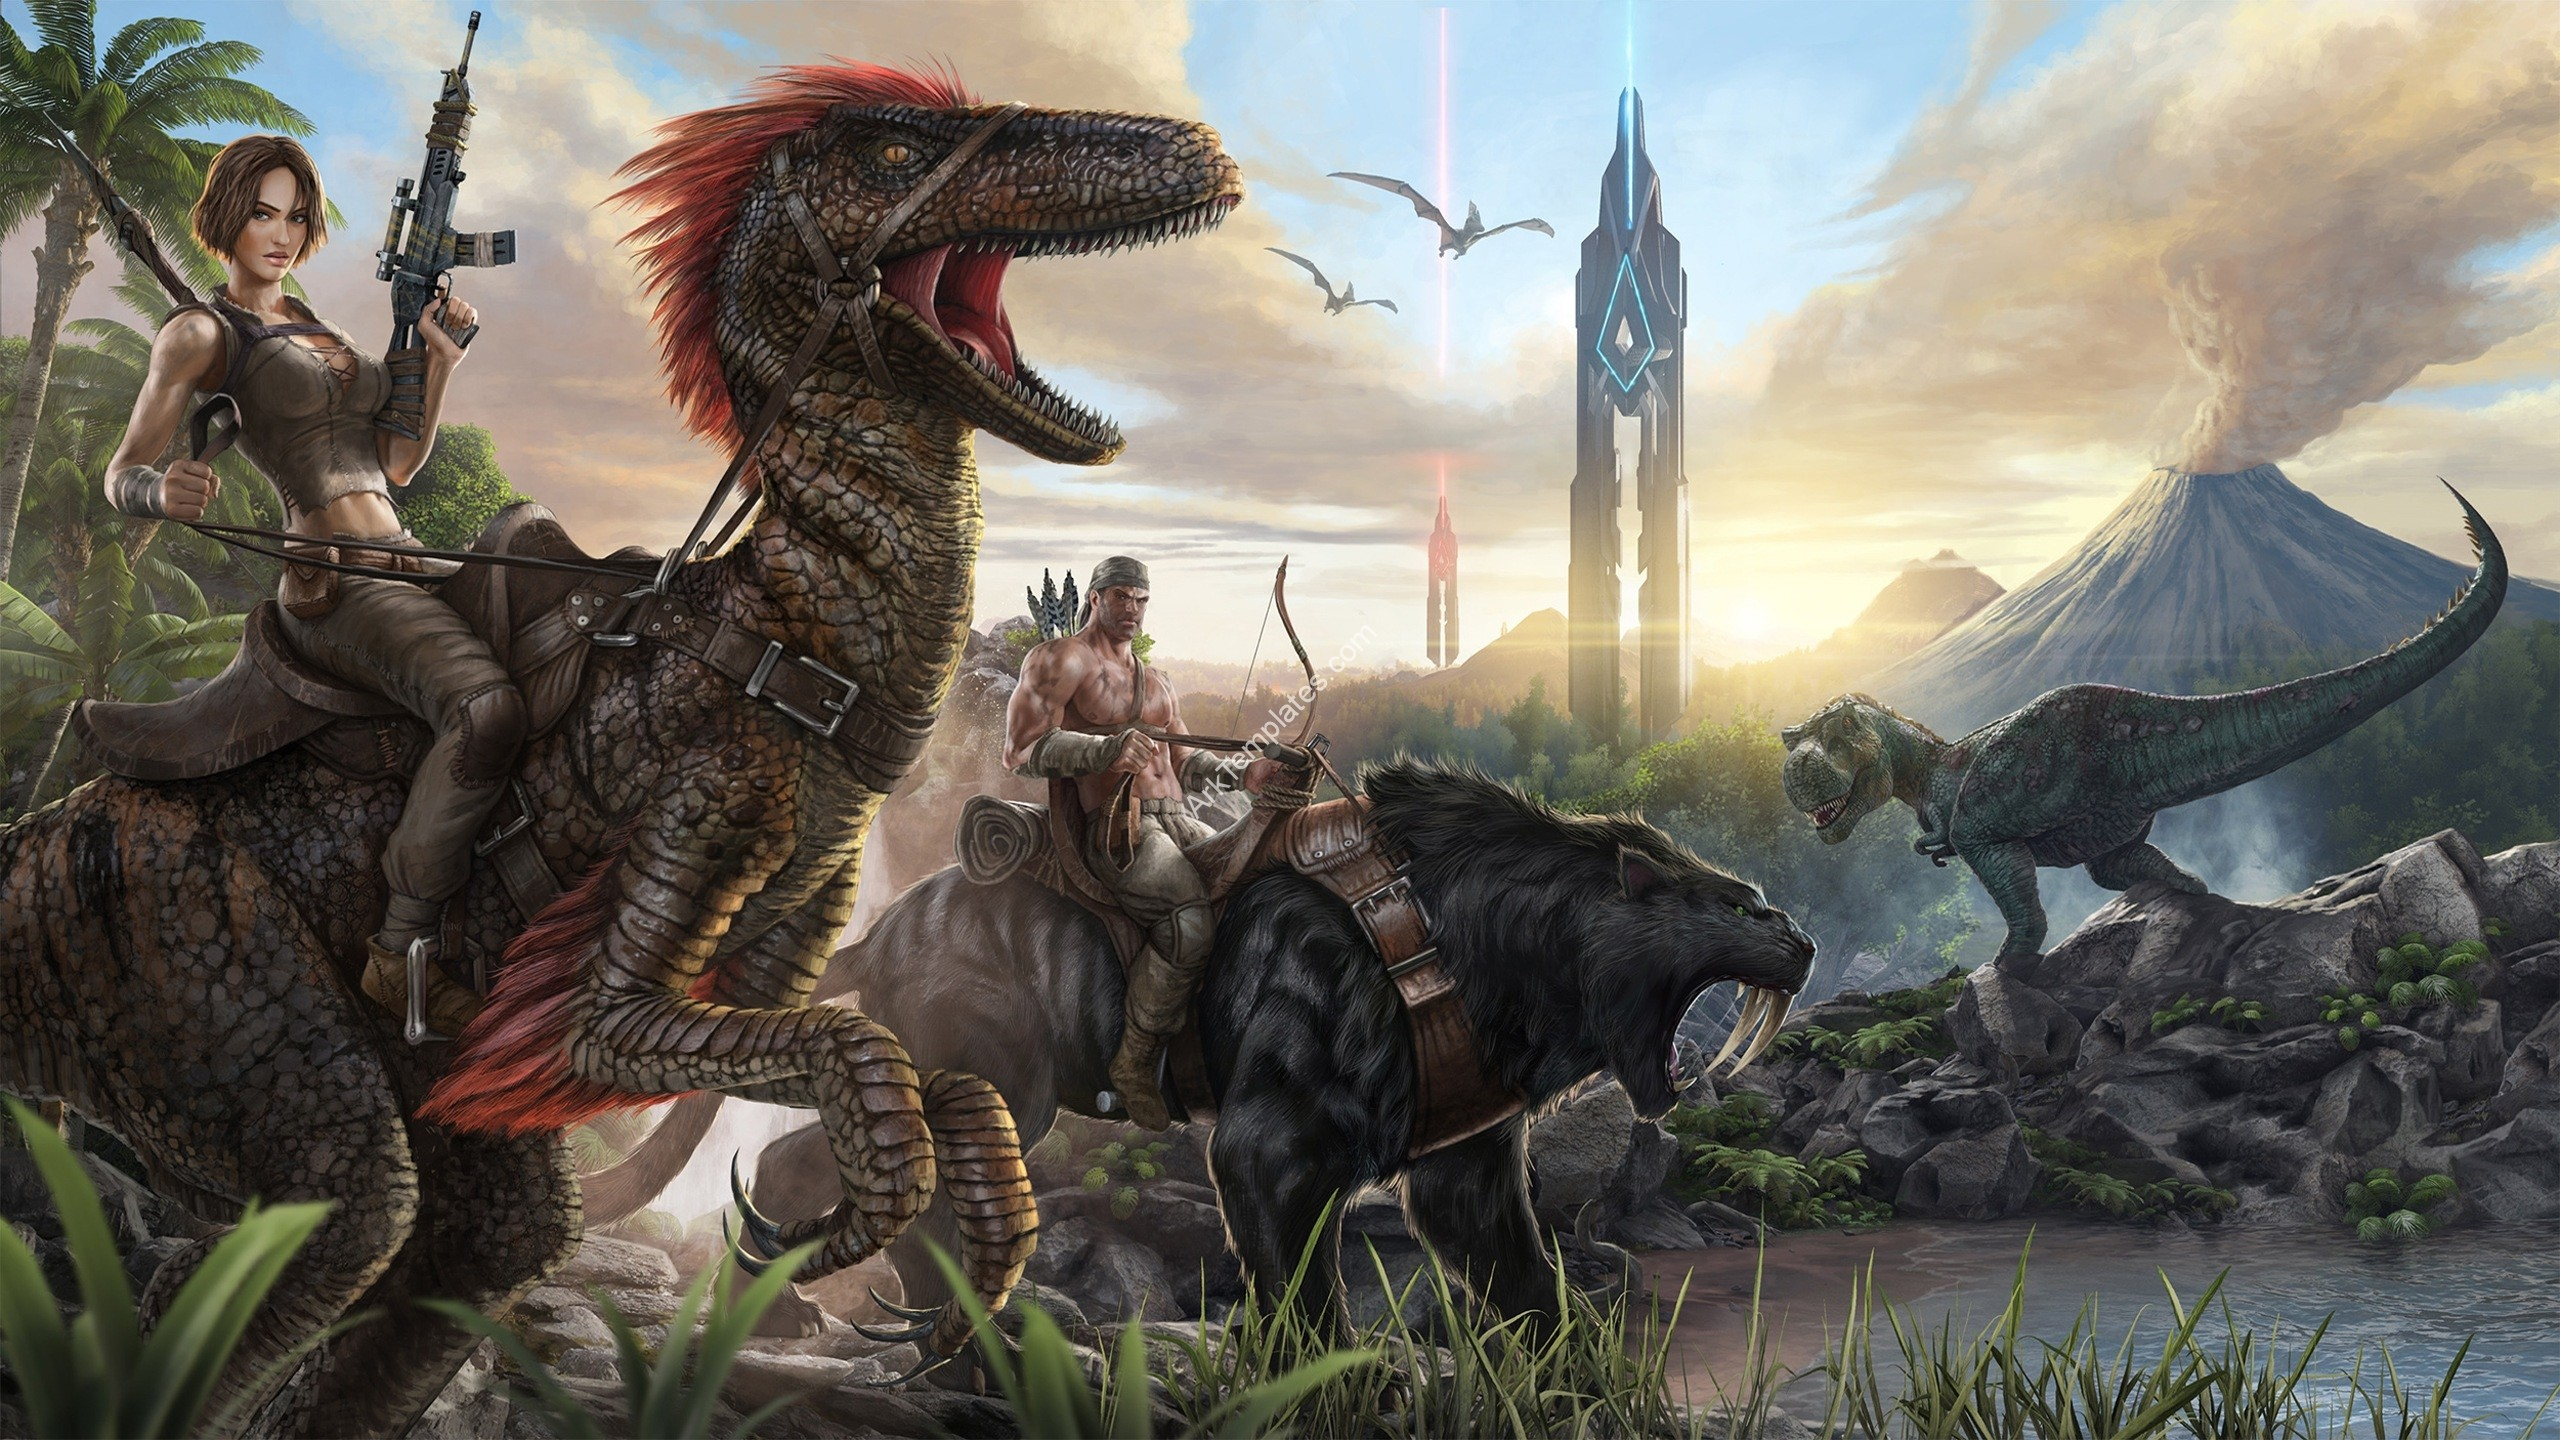 Spinosaurus Wallpaper Hd 76 Images